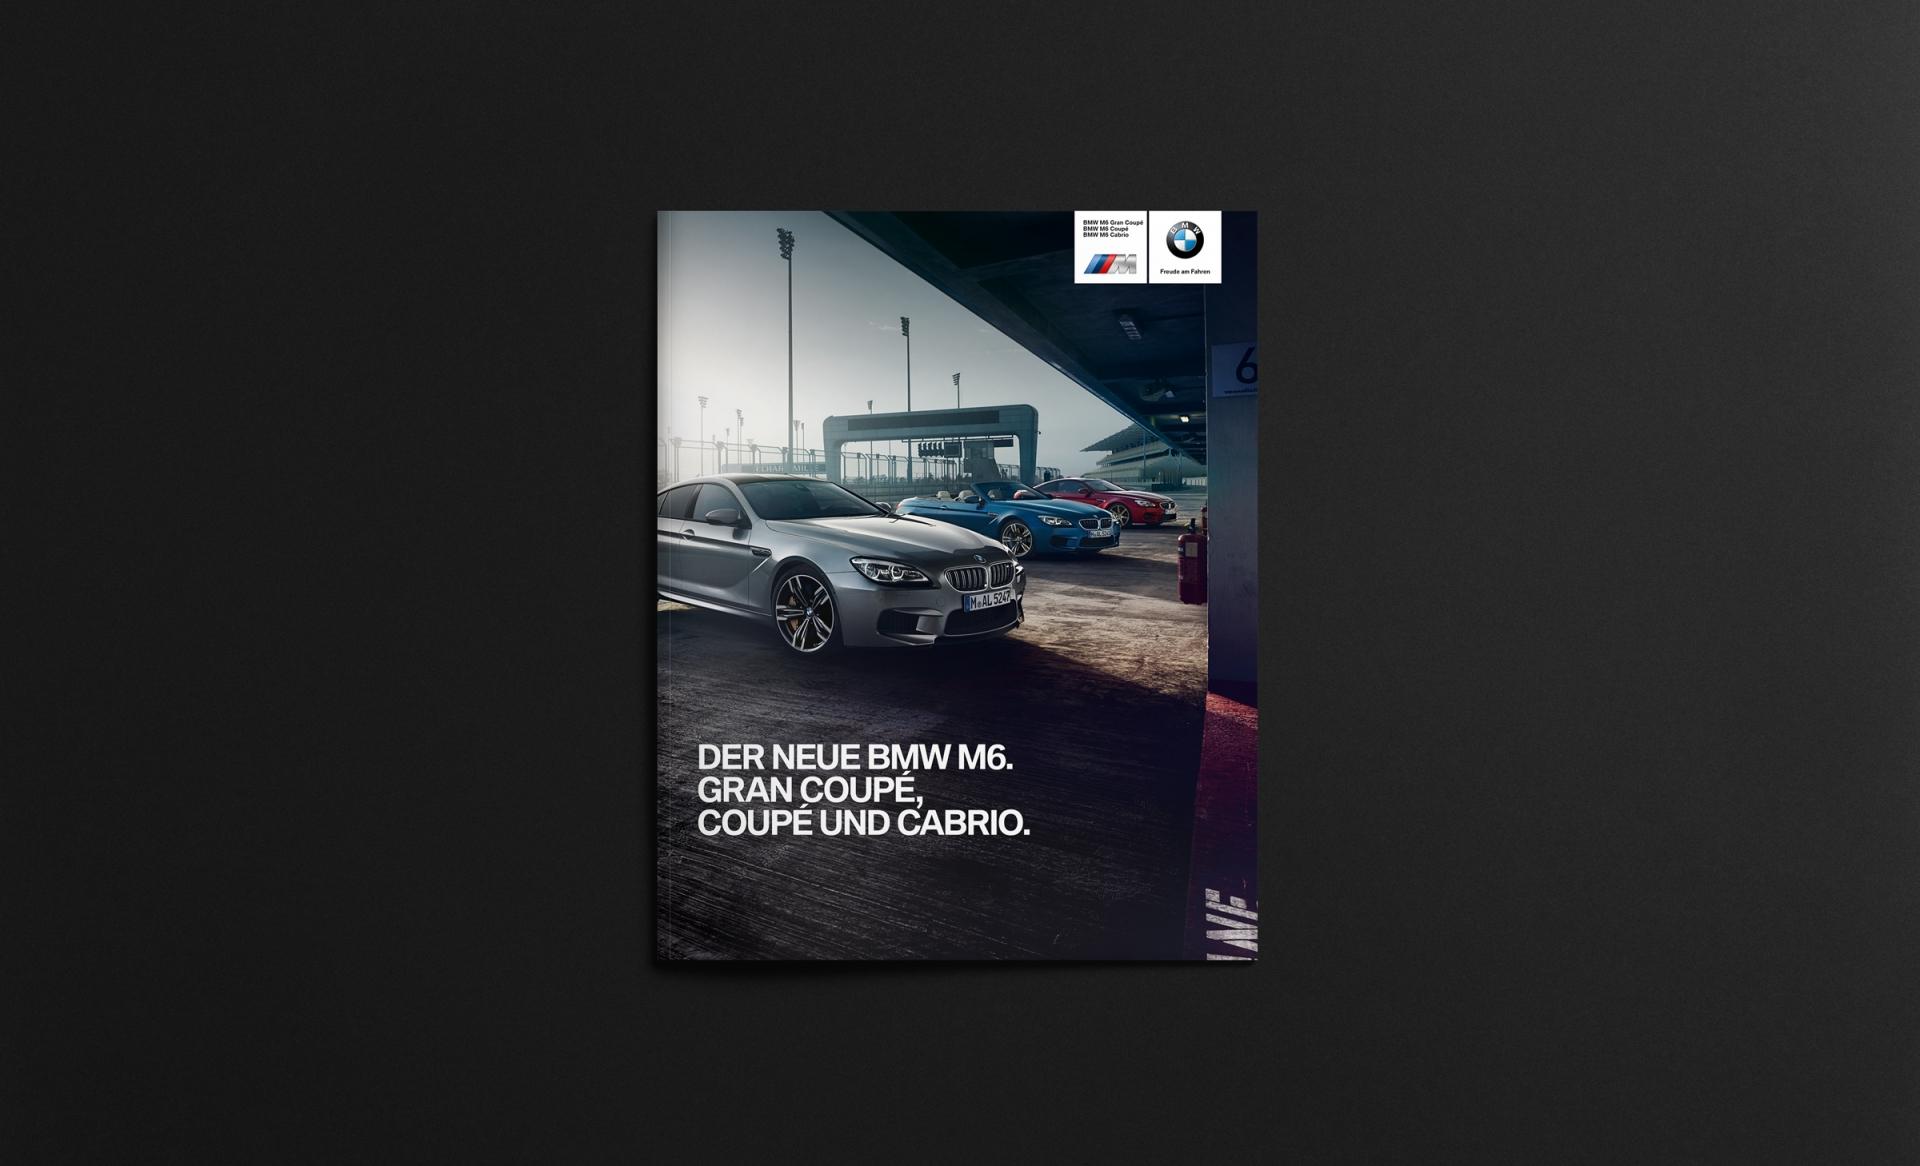 Norman Reuter BMW M6 Gran Coupé, Coupé & Cabrio